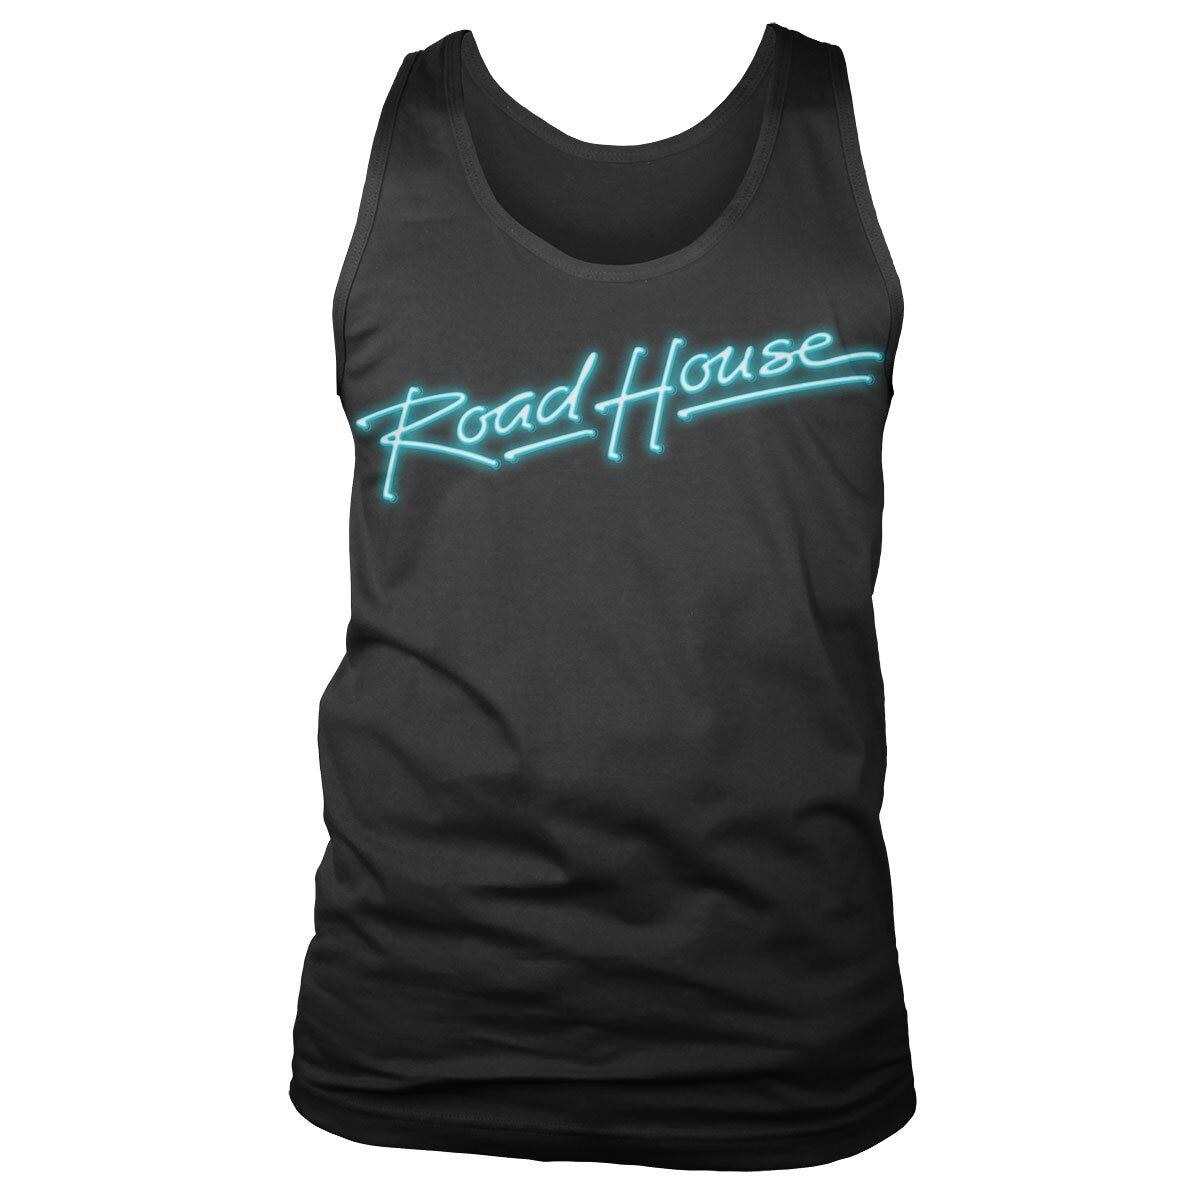 Road House Logo Tank Top